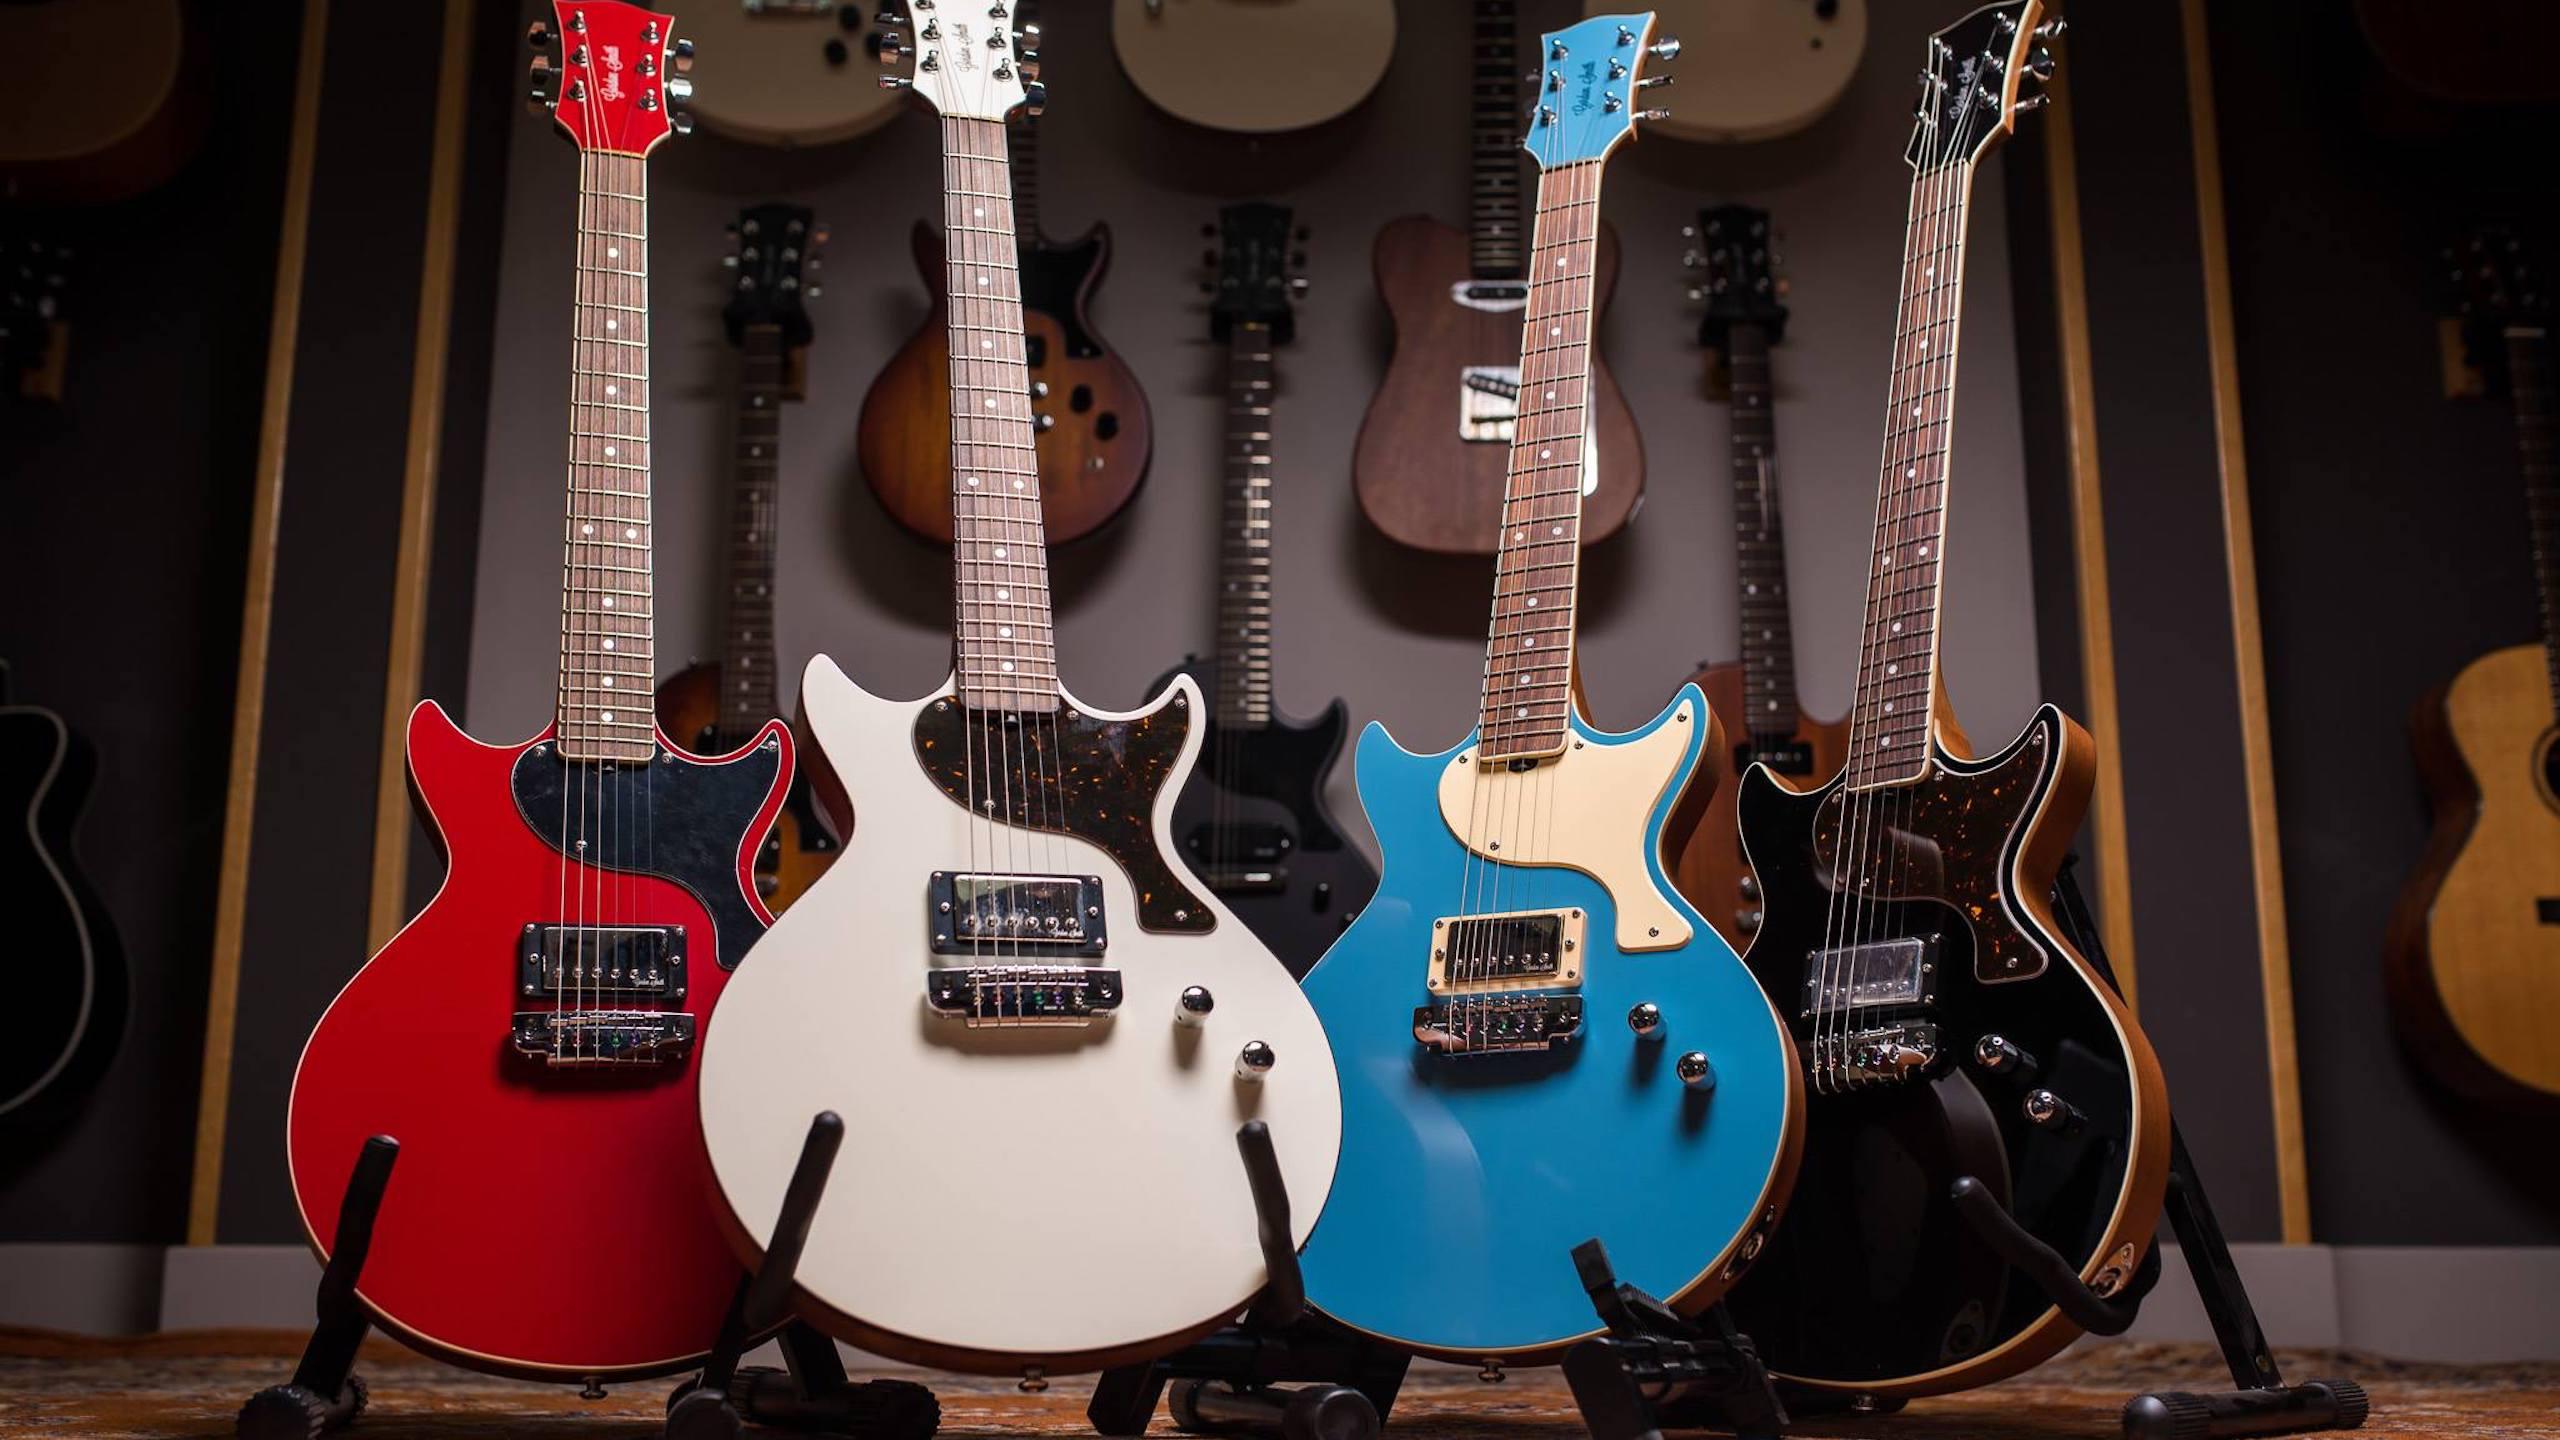 Guitars of the week